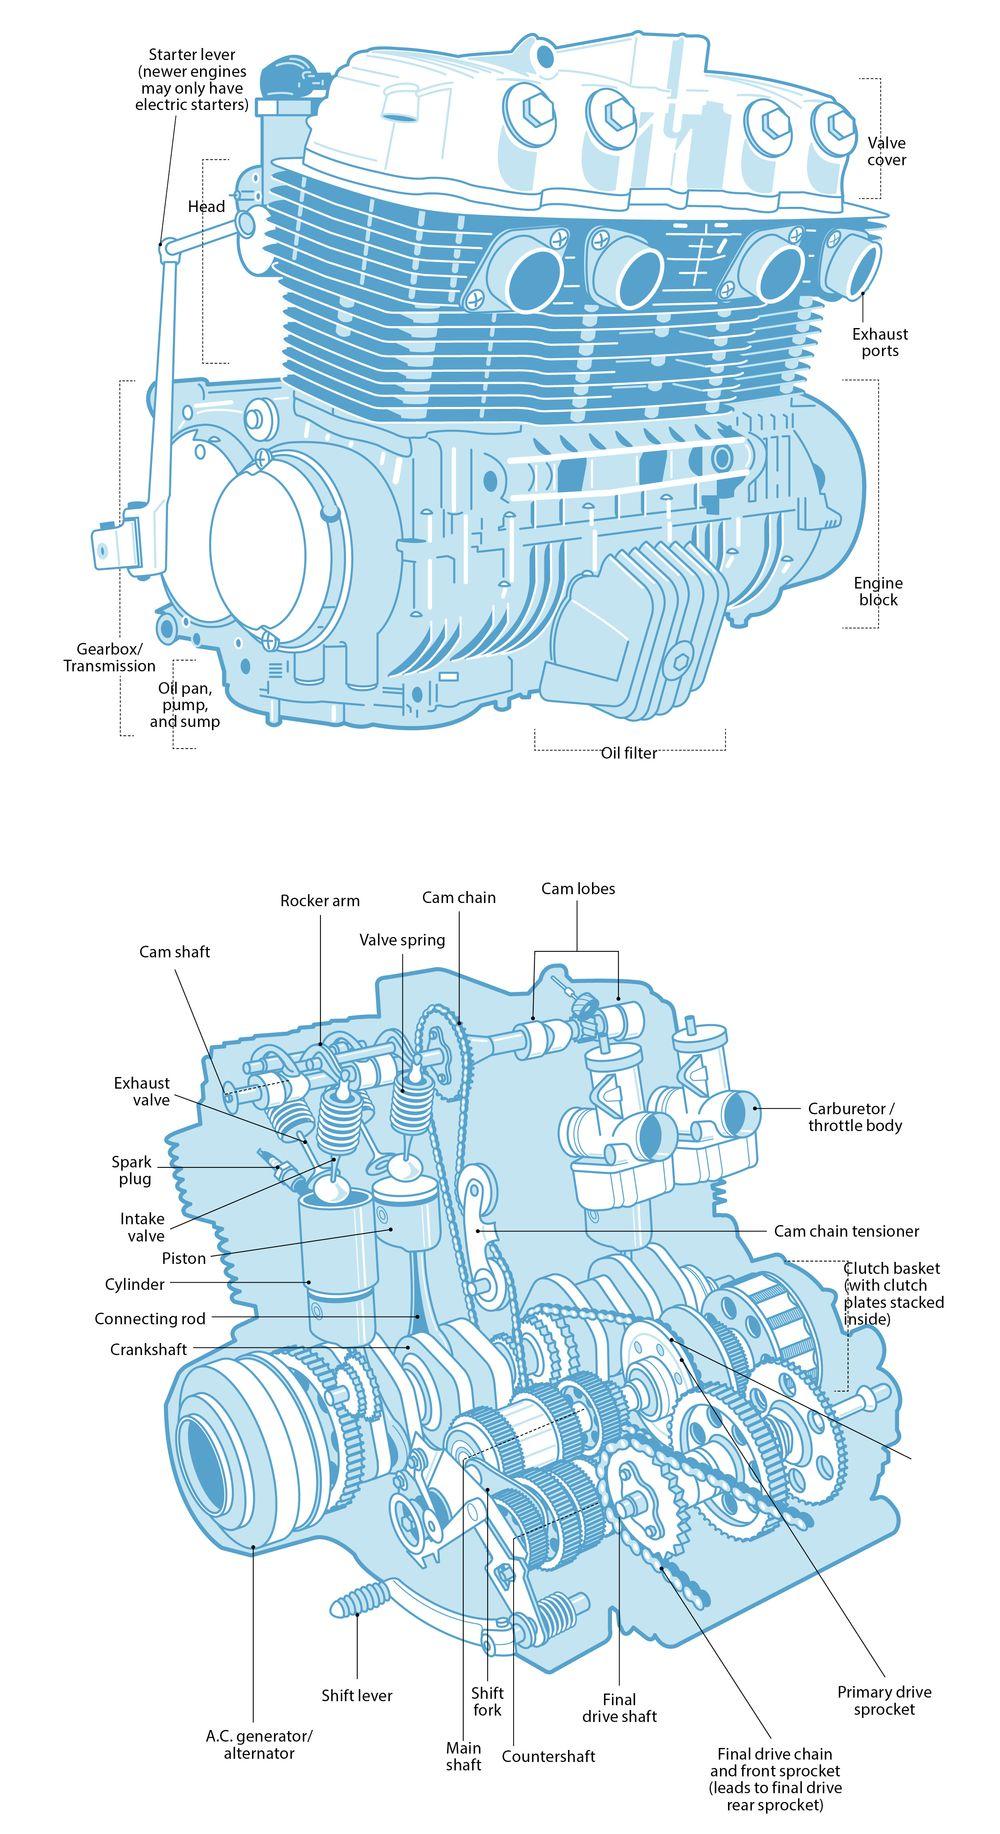 VO_2843] Cbr Motorcycle Engine Shaft Diagram Schematic WiringHopad Scata Sulf Lopla Funi Wigeg Mohammedshrine Librar Wiring 101